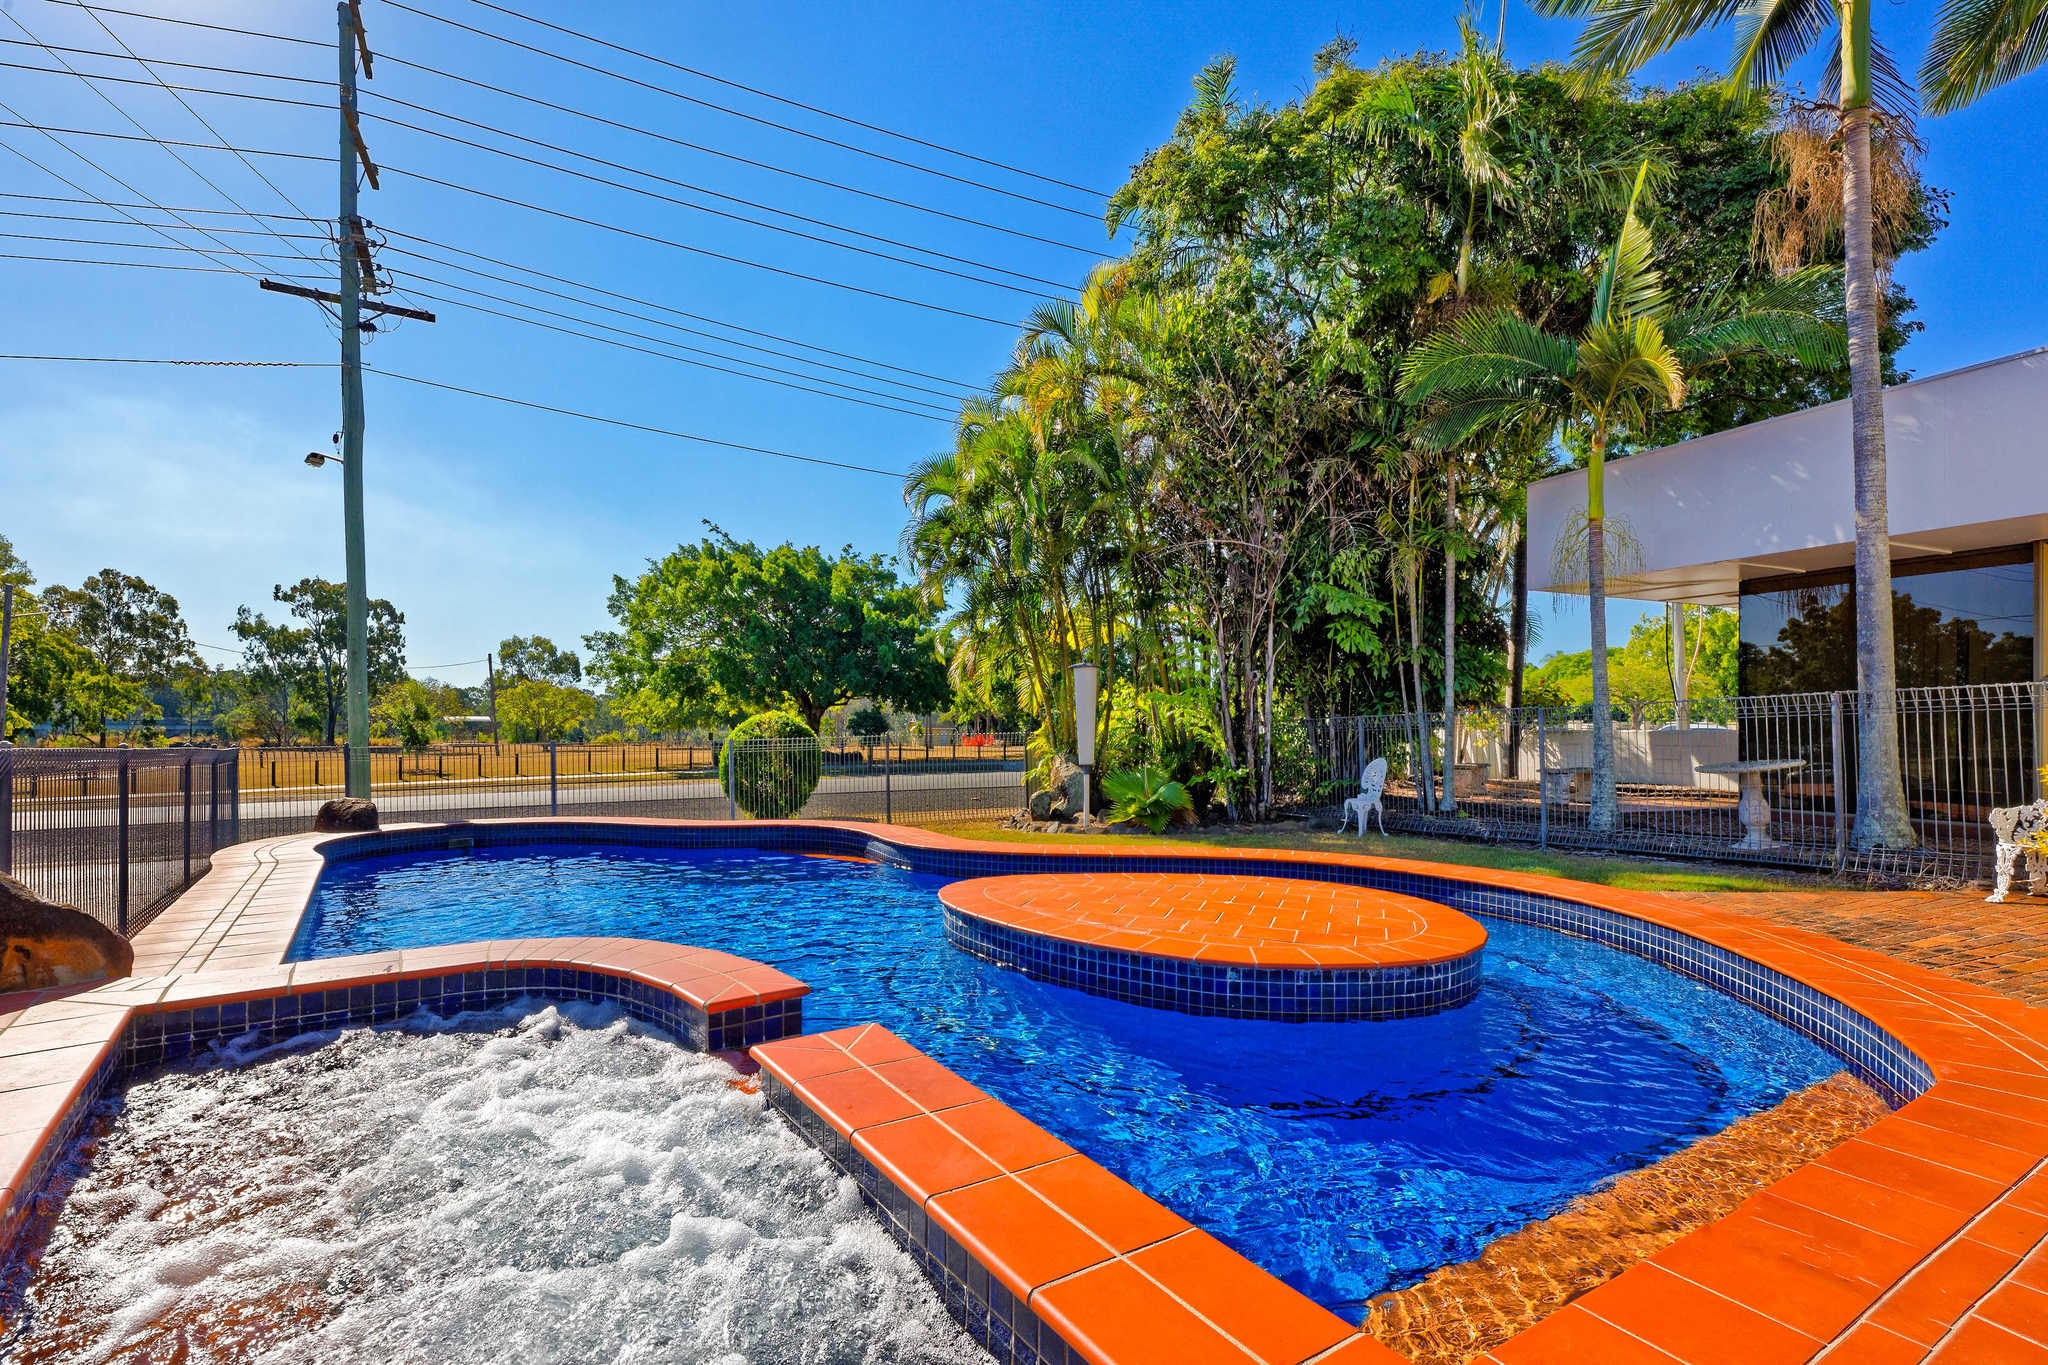 Econo Lodge Park Lane - Bundaberg, QLD 4670 - (07) 4151 2341 | ShowMeLocal.com